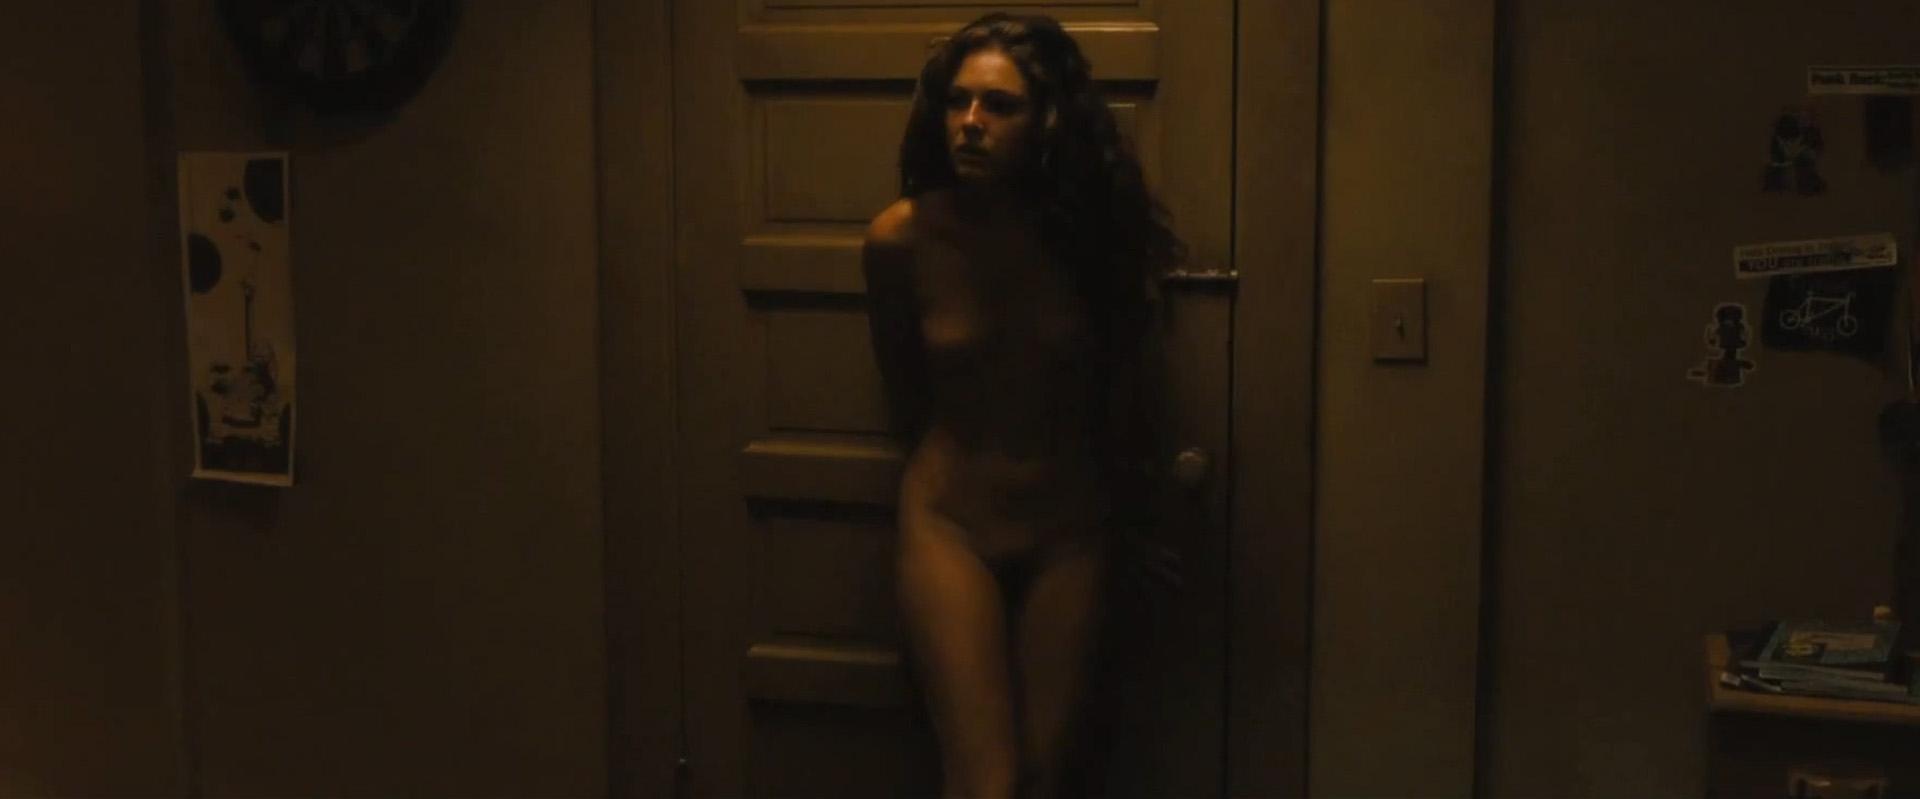 sexy ebony women free porn videos